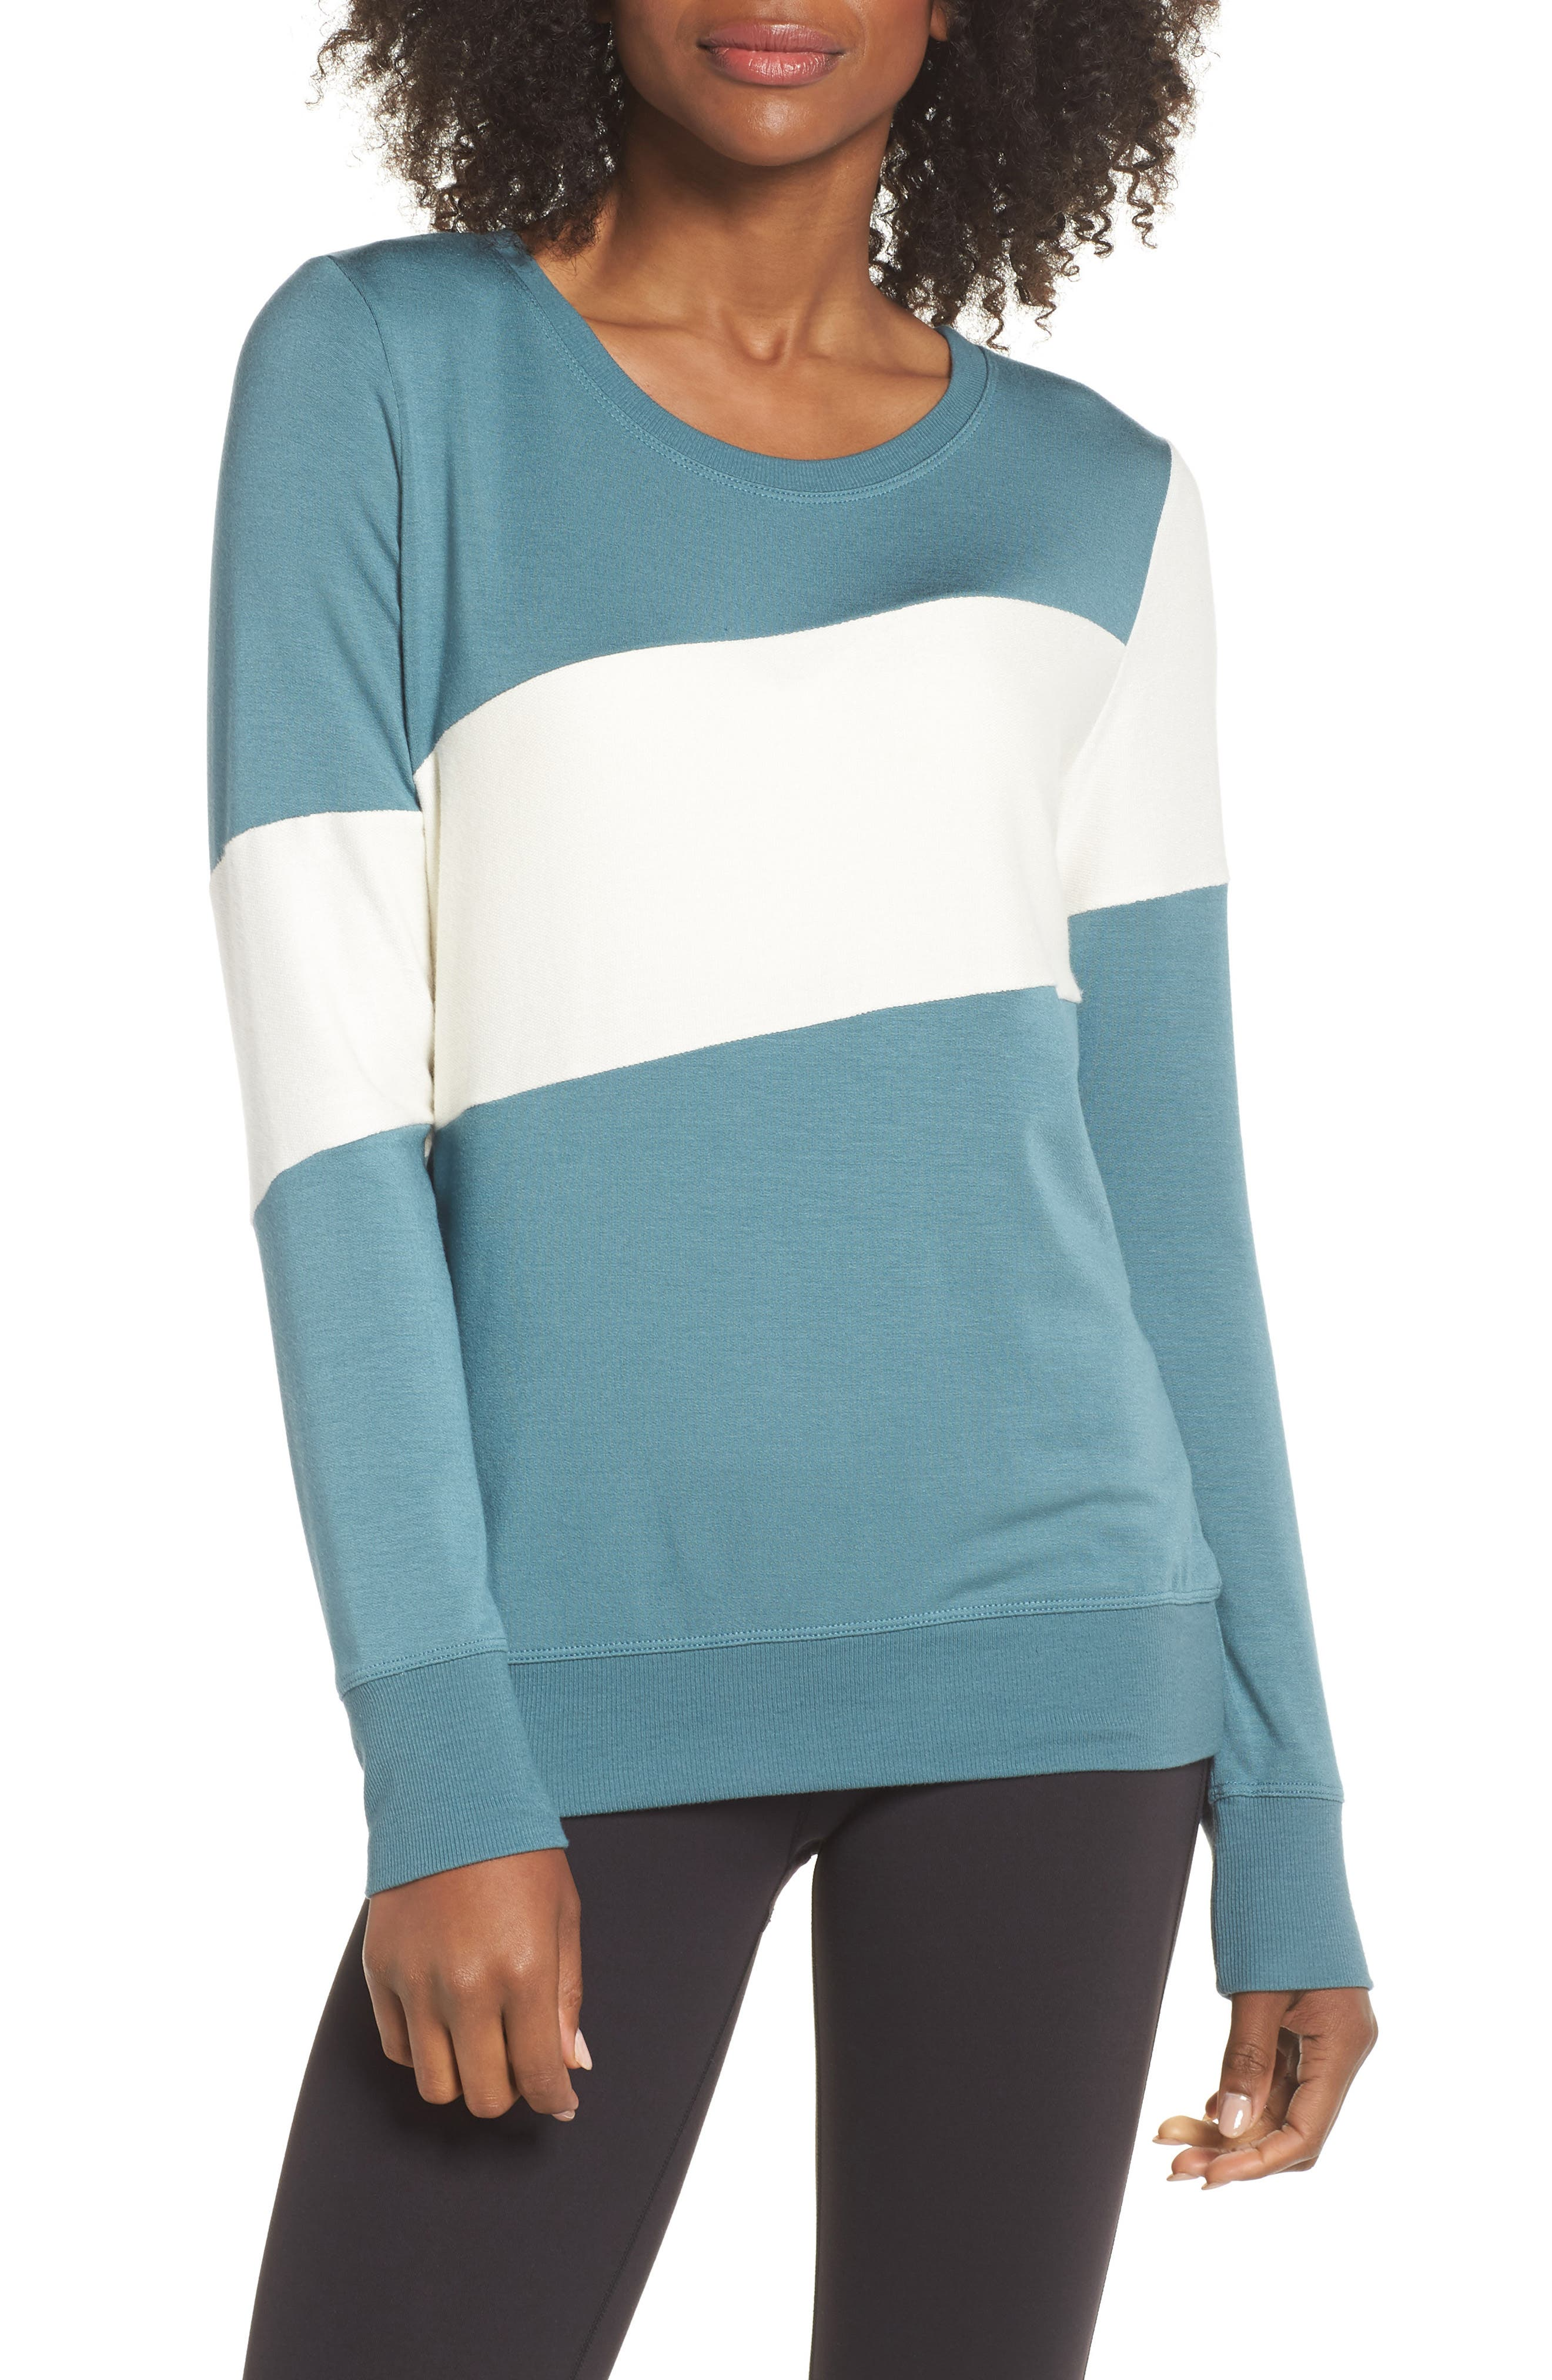 Ramp Sweatshirt,                             Main thumbnail 1, color,                             Blue Surf/ Off White